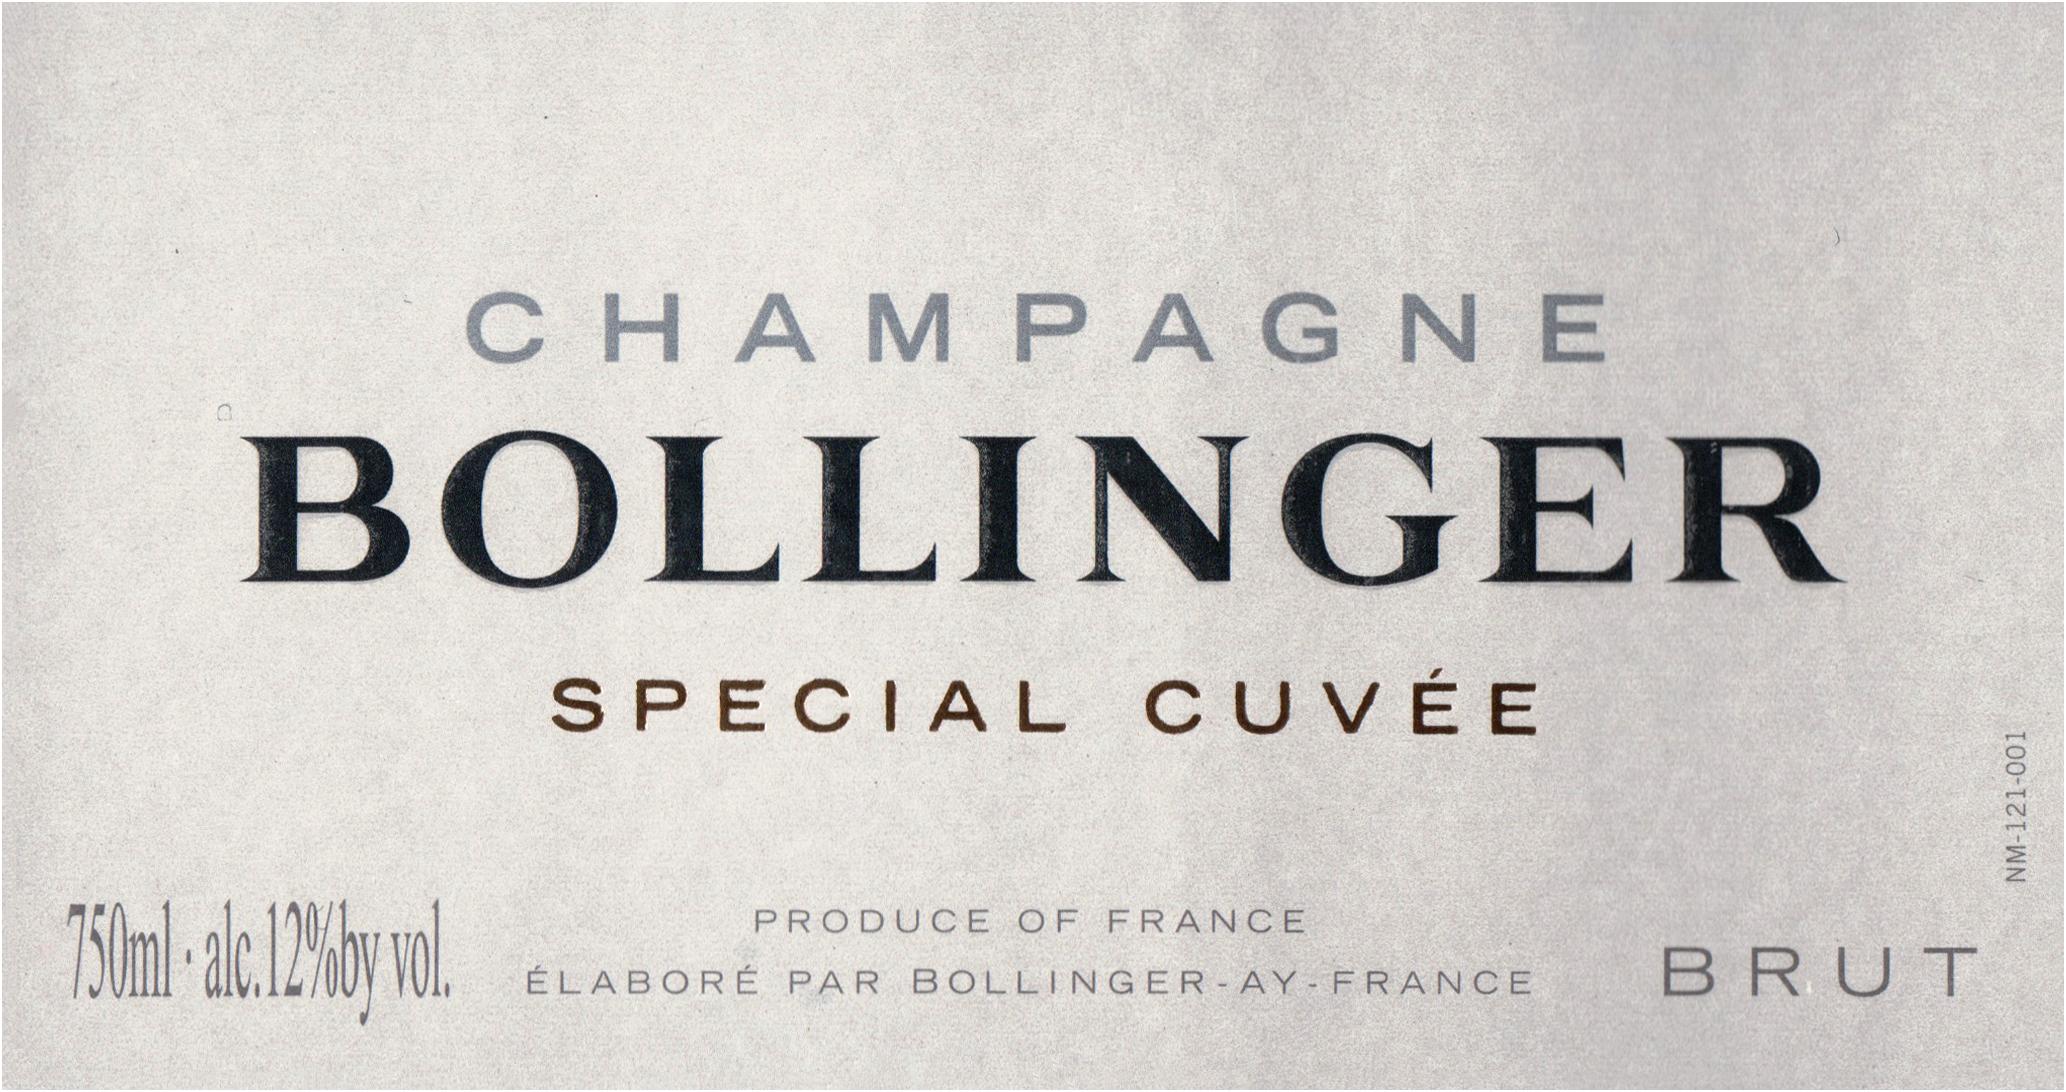 Bollinger Brut Special Cuvee